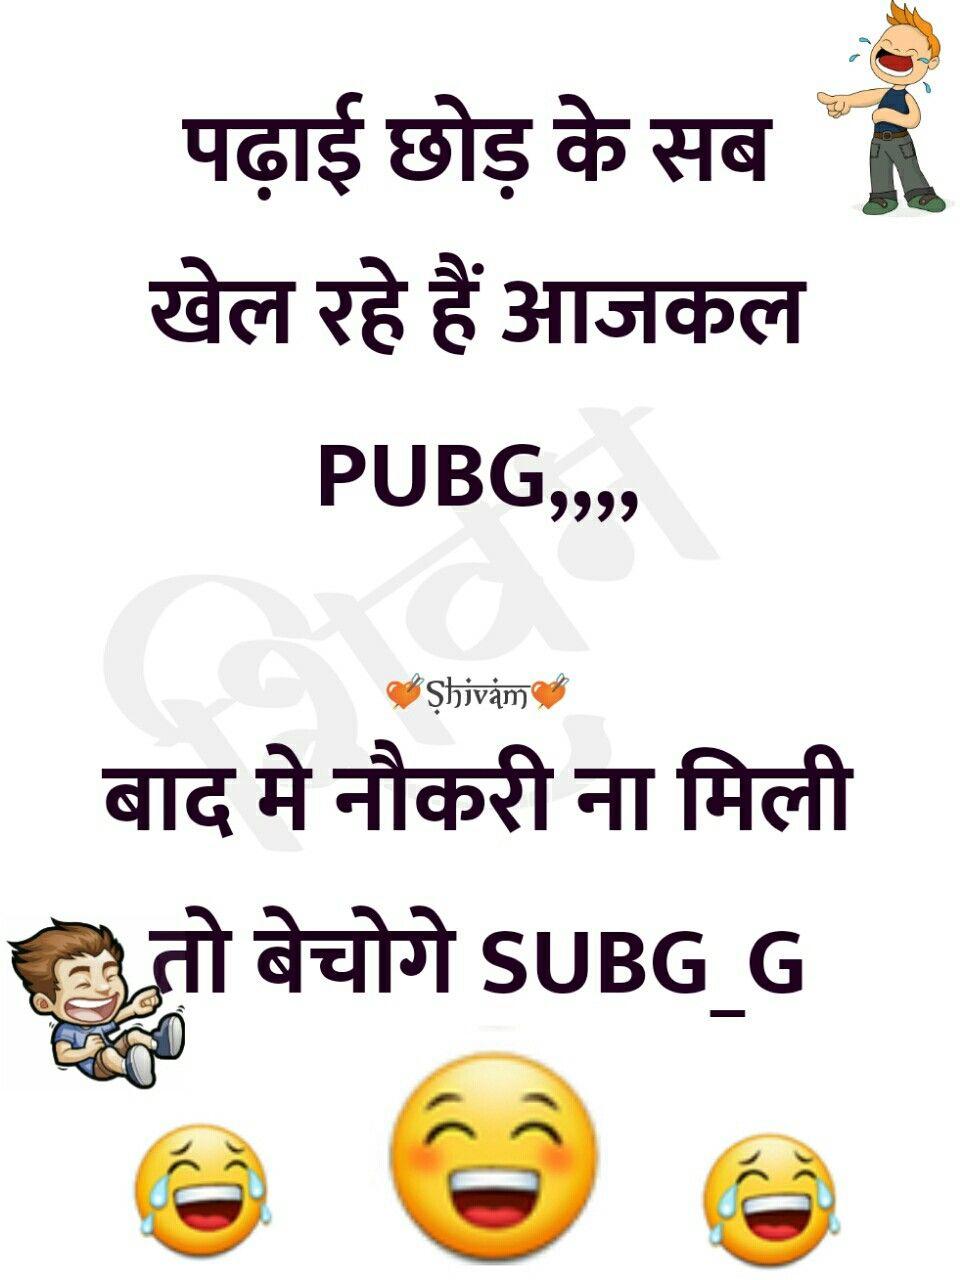 Joke Jokeinhindi Hindijoke Shivamr7 Joke In Hindi ह द ज क Very Funny Jokes Some Funny Jokes Jokes Quotes